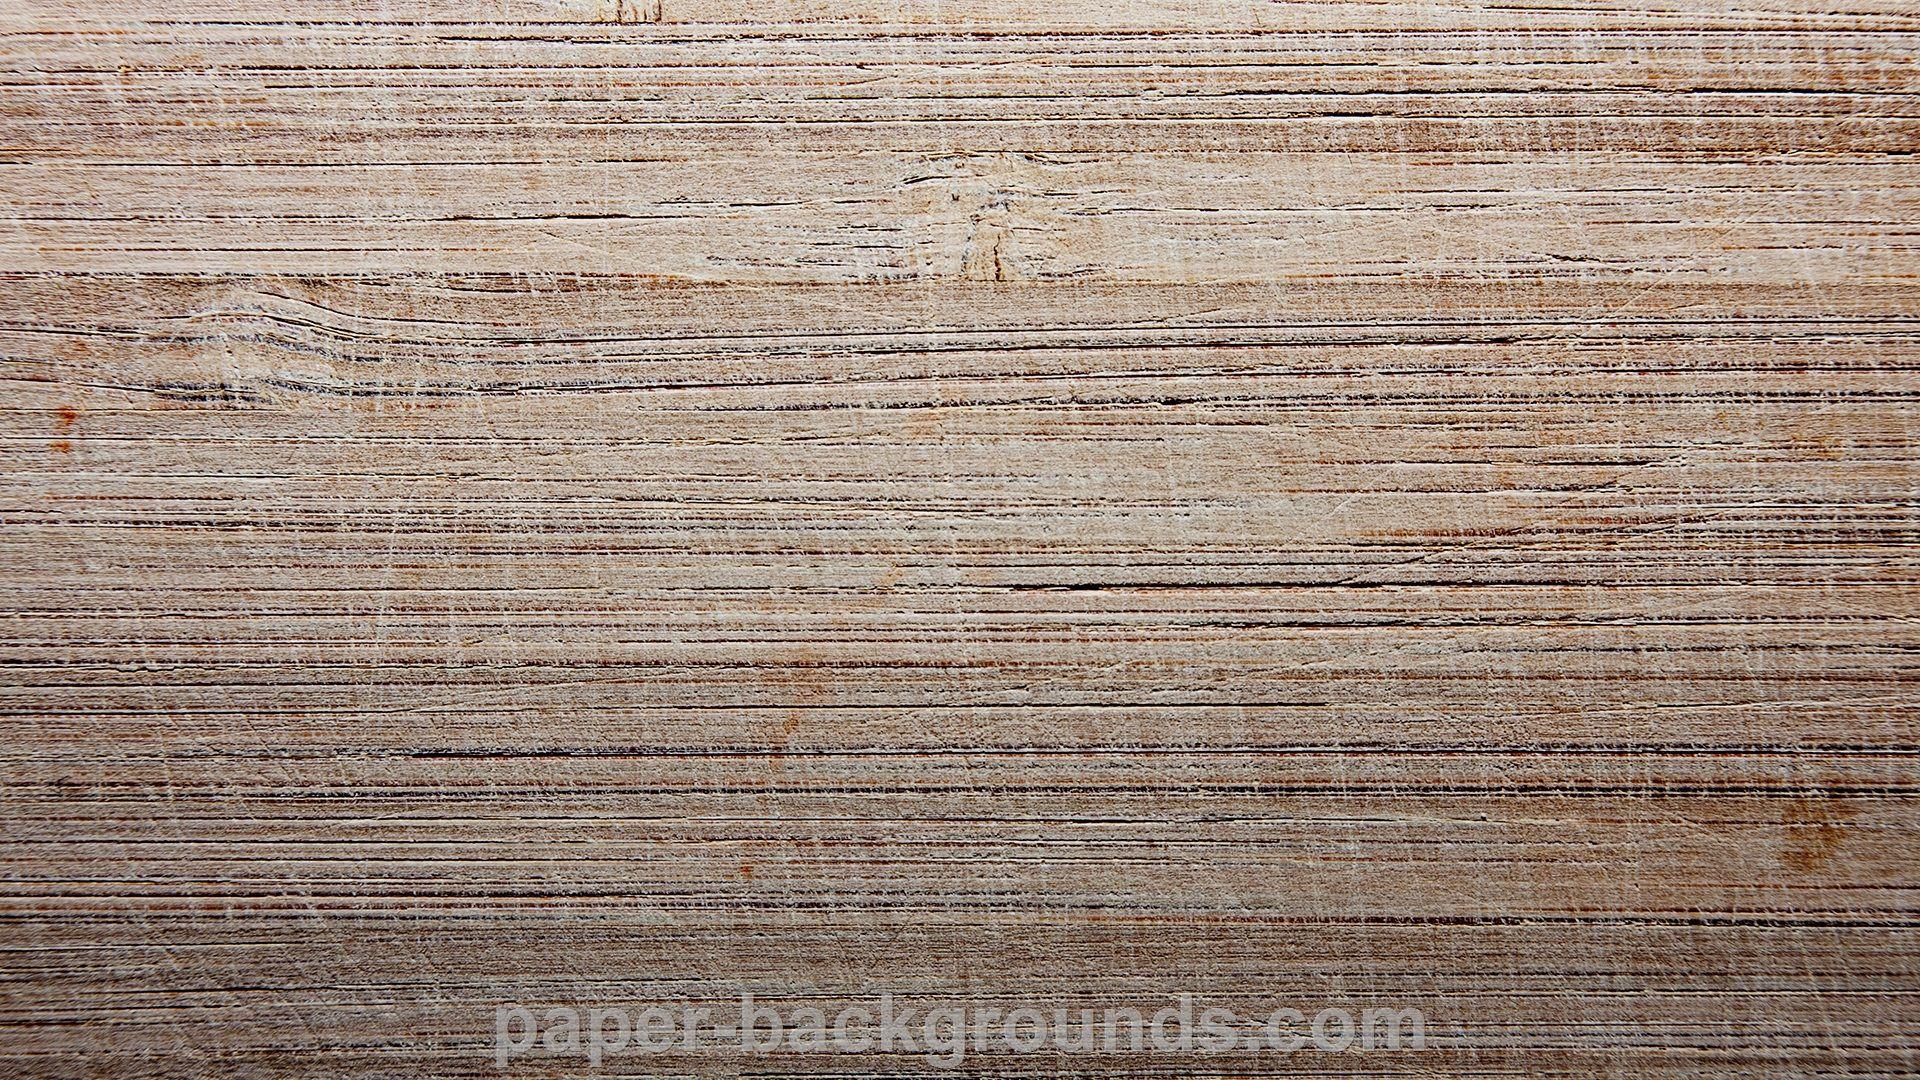 Old Wood Texture Background Hd1 Jpg 1920 1080 Wood Texture Background Texture Background Hd Light Wood Texture